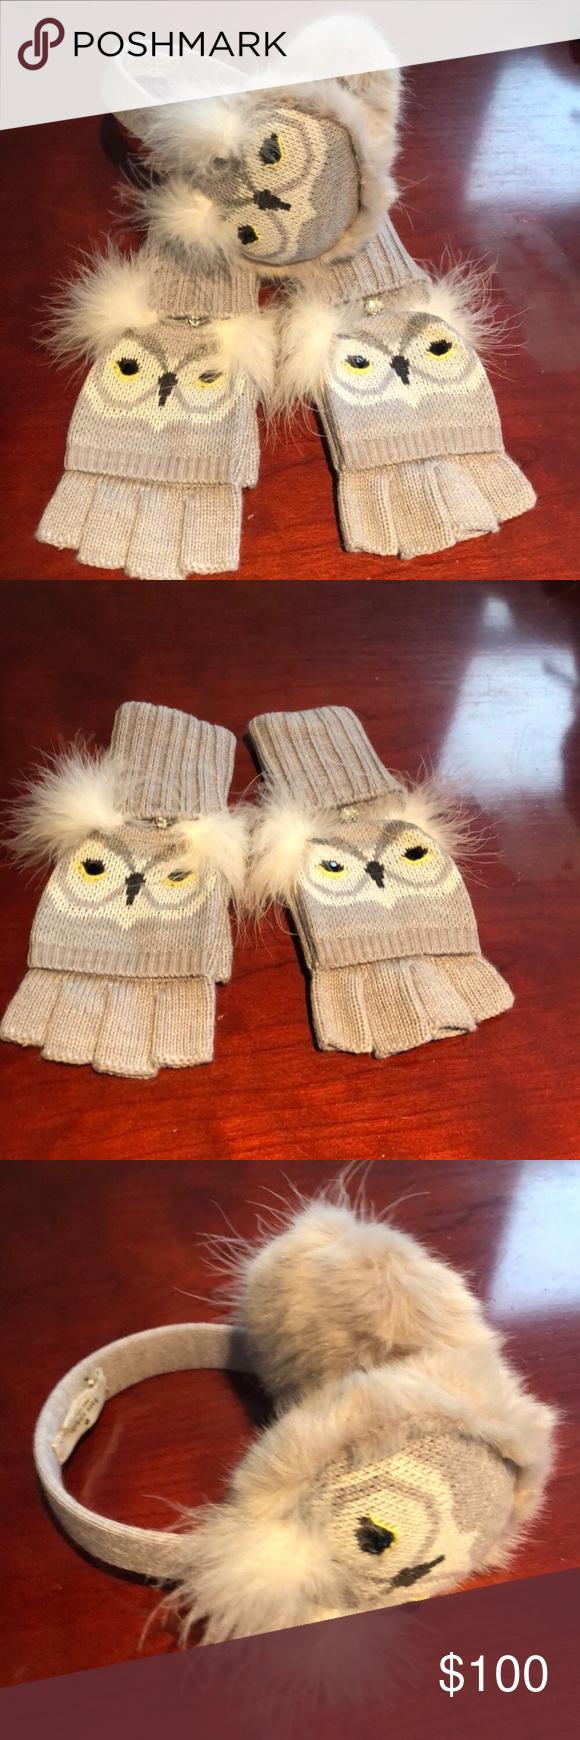 Kate Spade Who Me Owl Earmuffs Pop Top Mittens Earmuffs Kate Spade Kate Spade Accessories